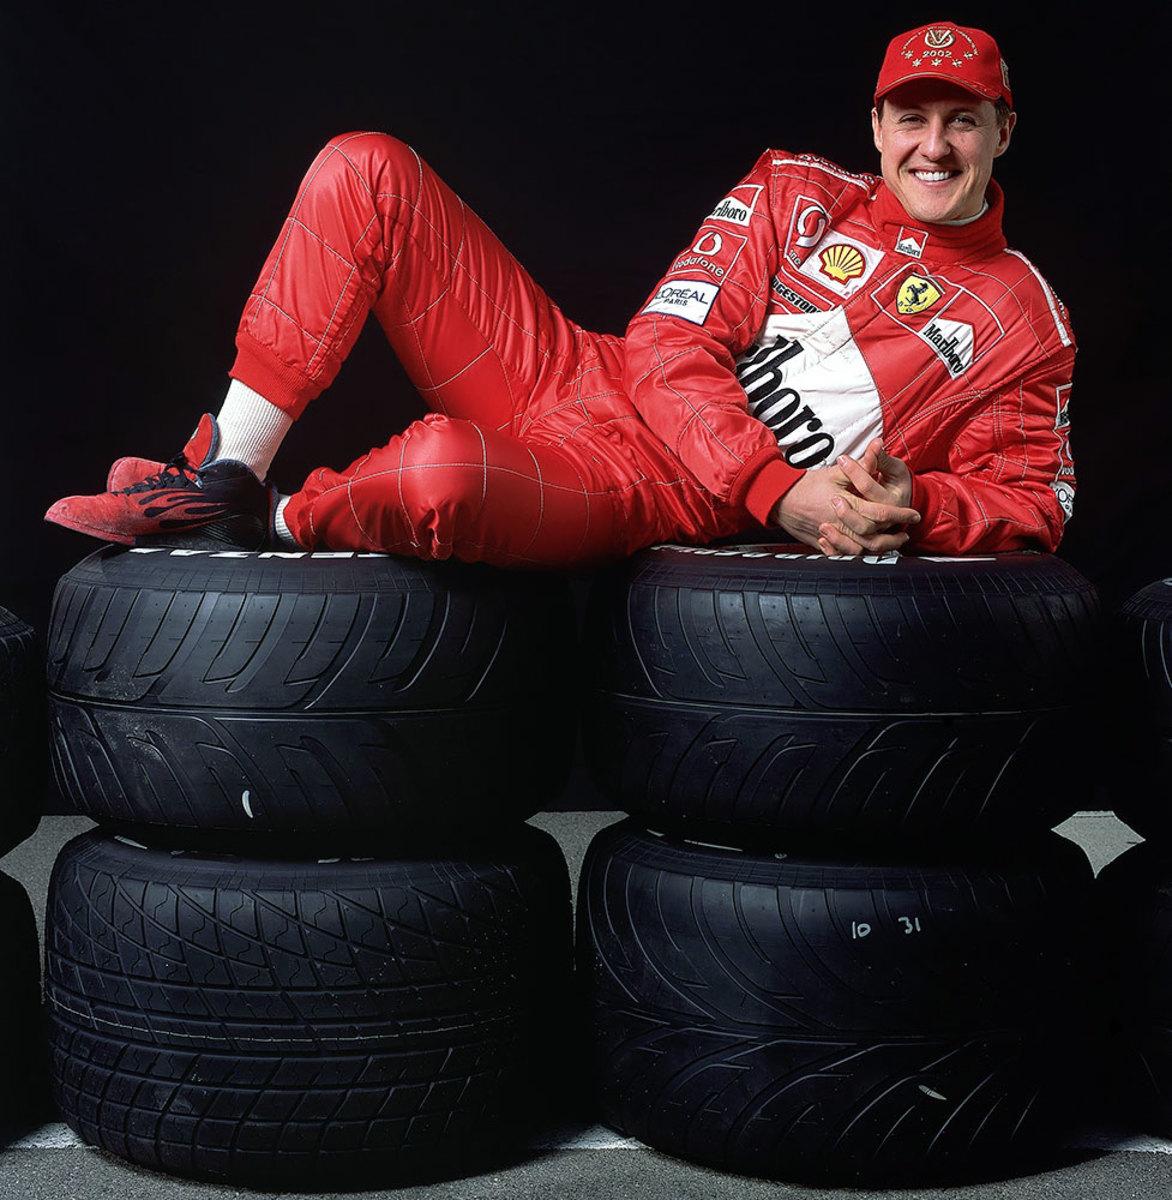 05-Michael-Schumacher-001285909.jpg